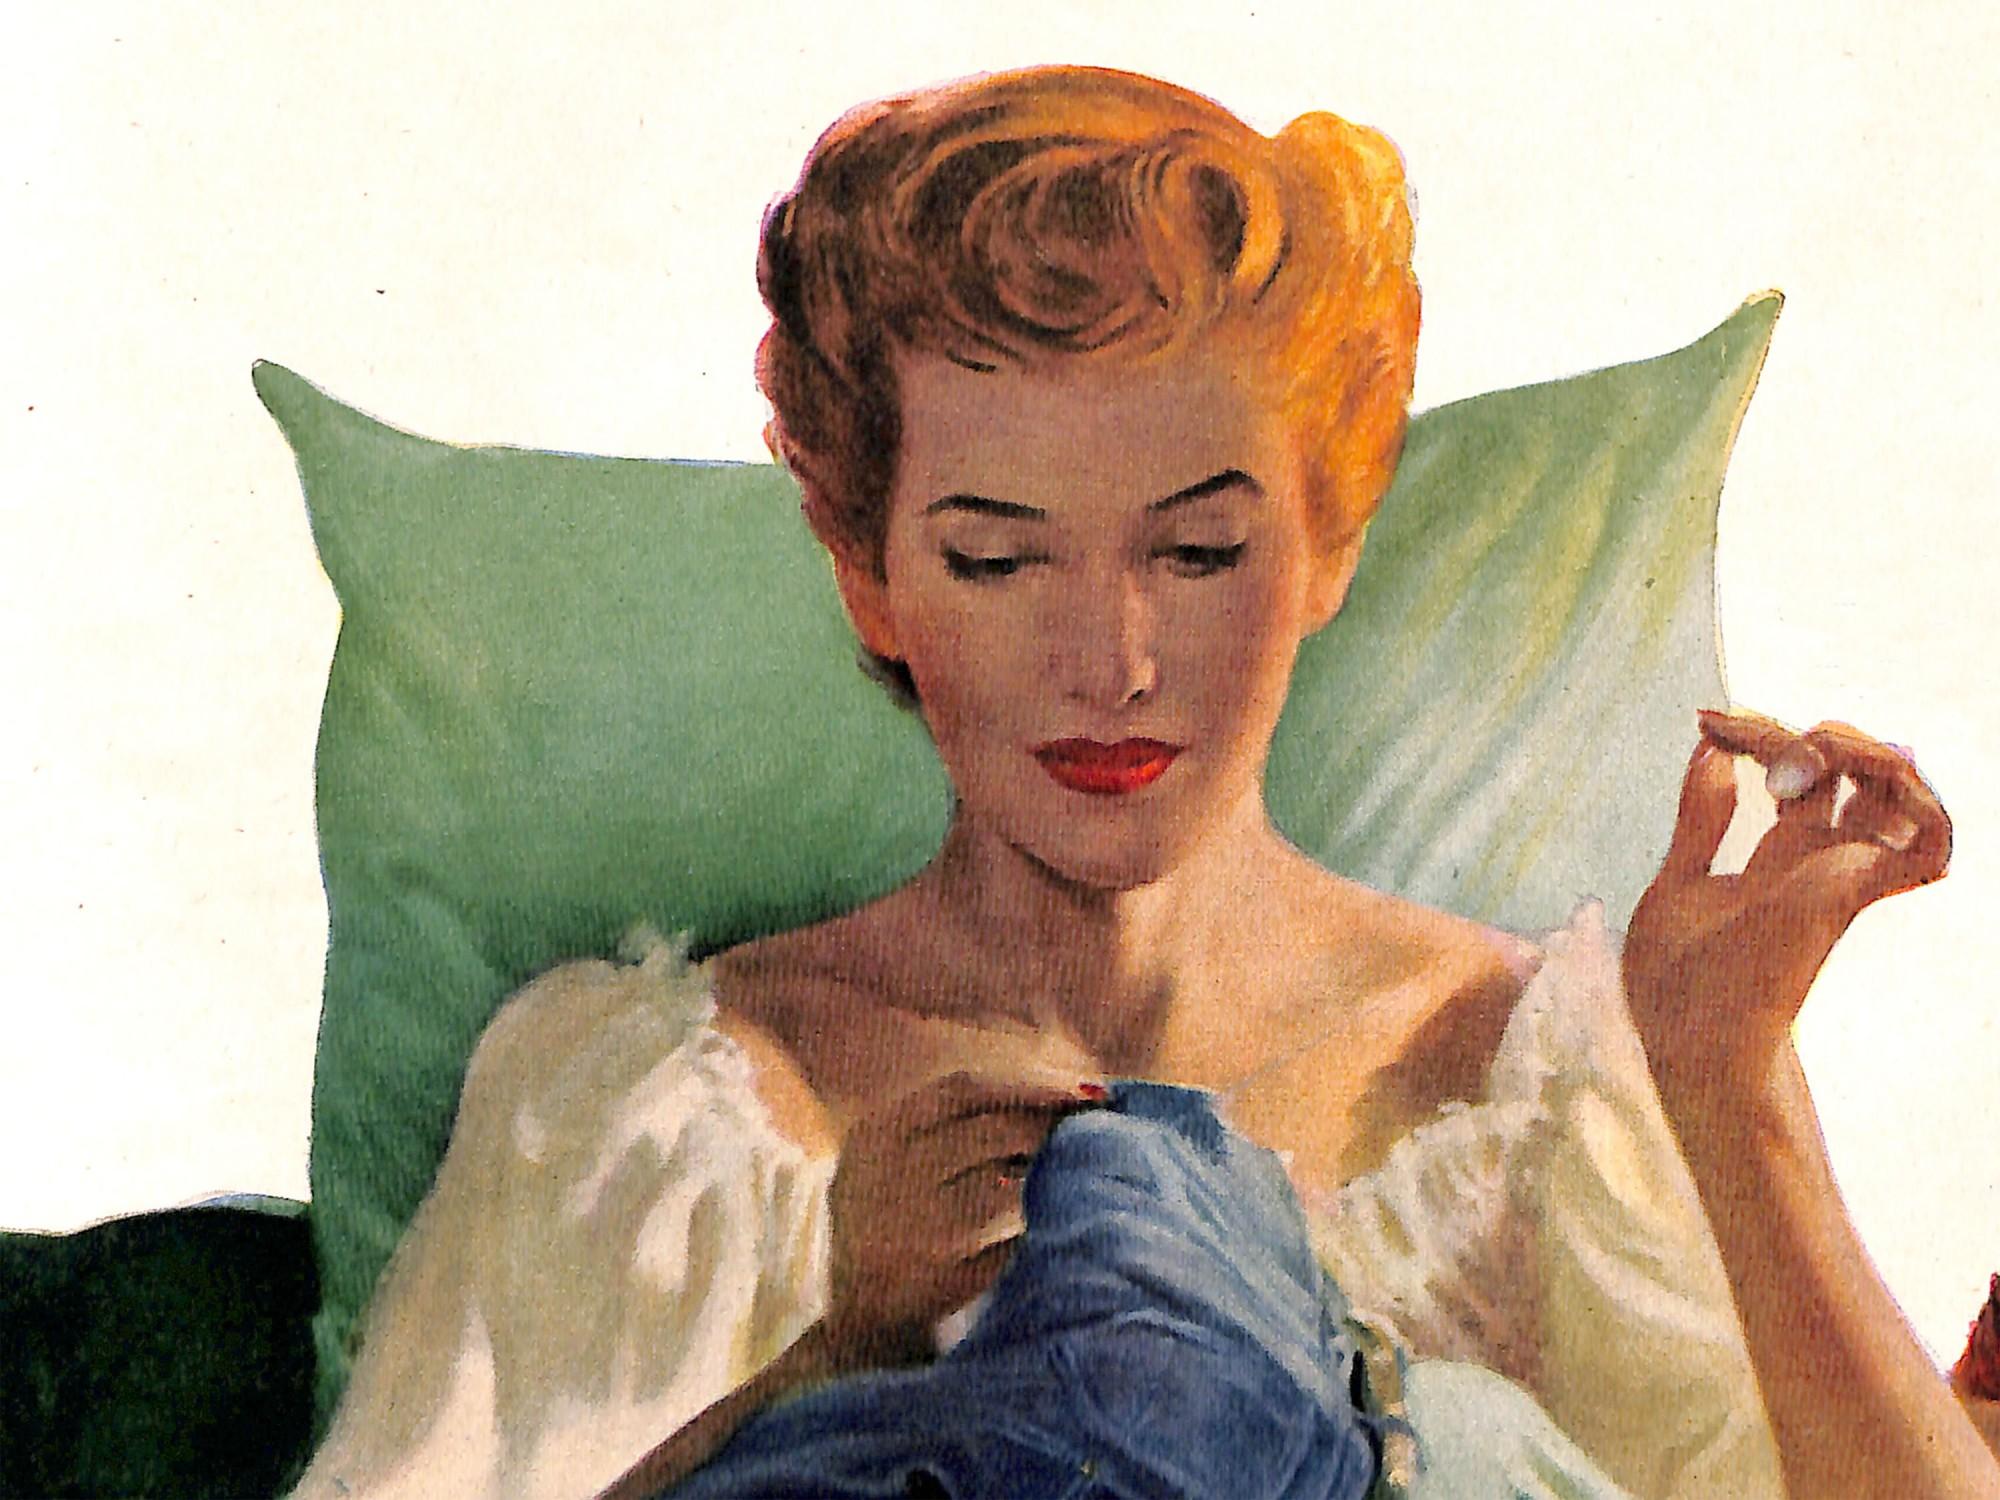 1952 Illustration by Robert Harris